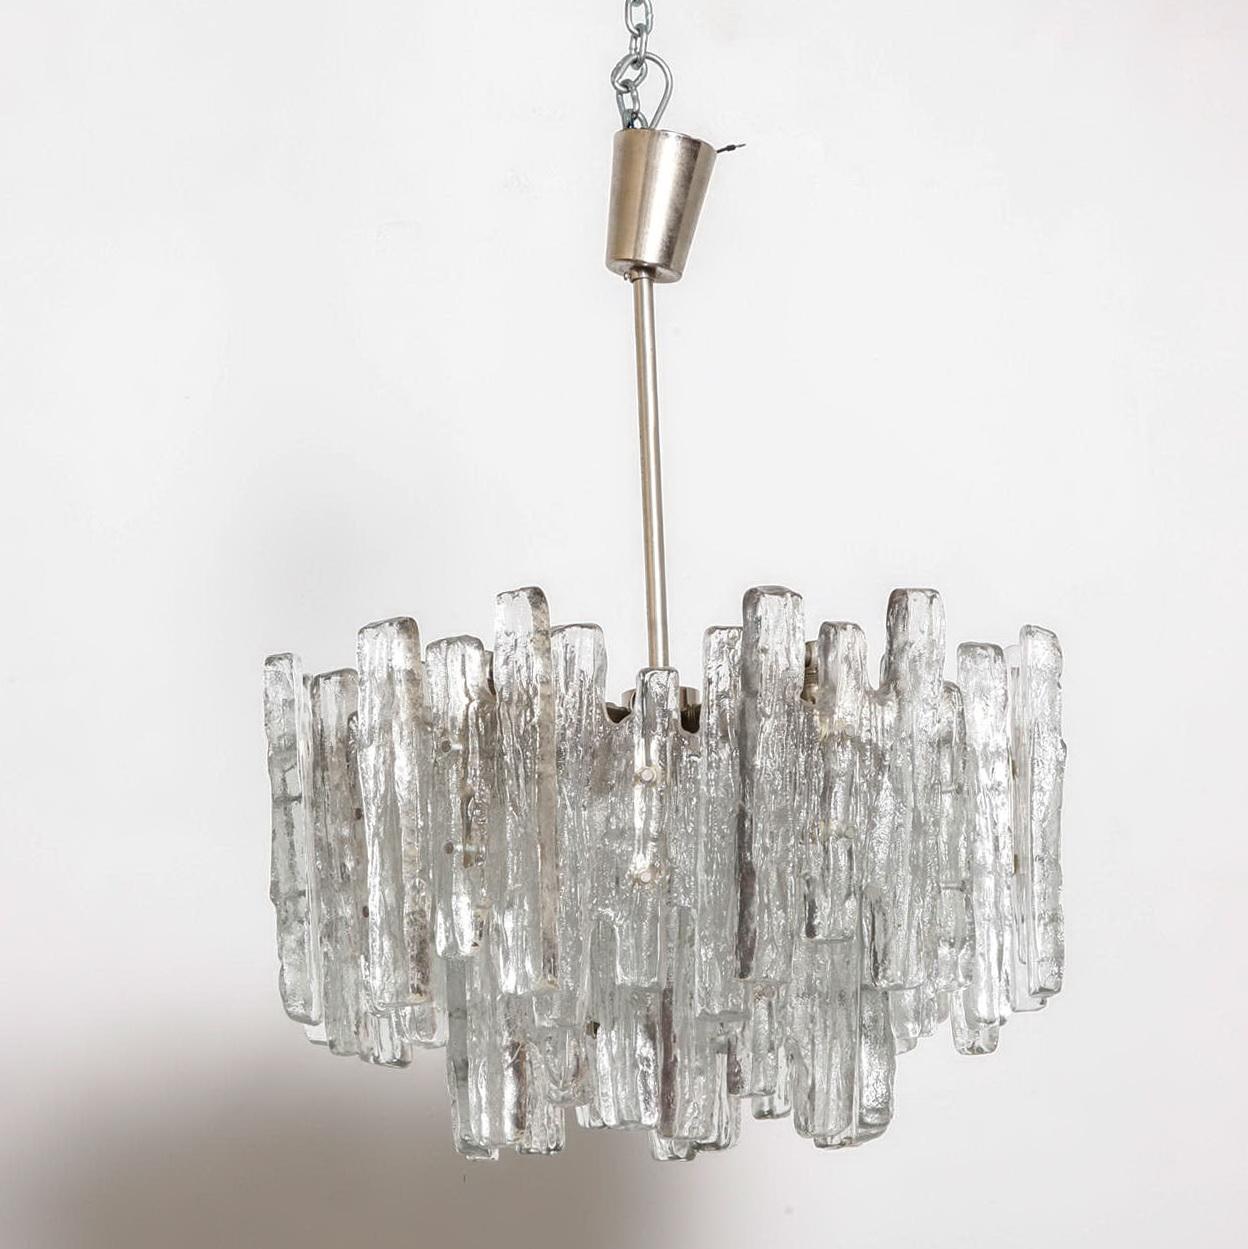 Extra large chandeliers best home design 2018 for Large modern chandelier lighting